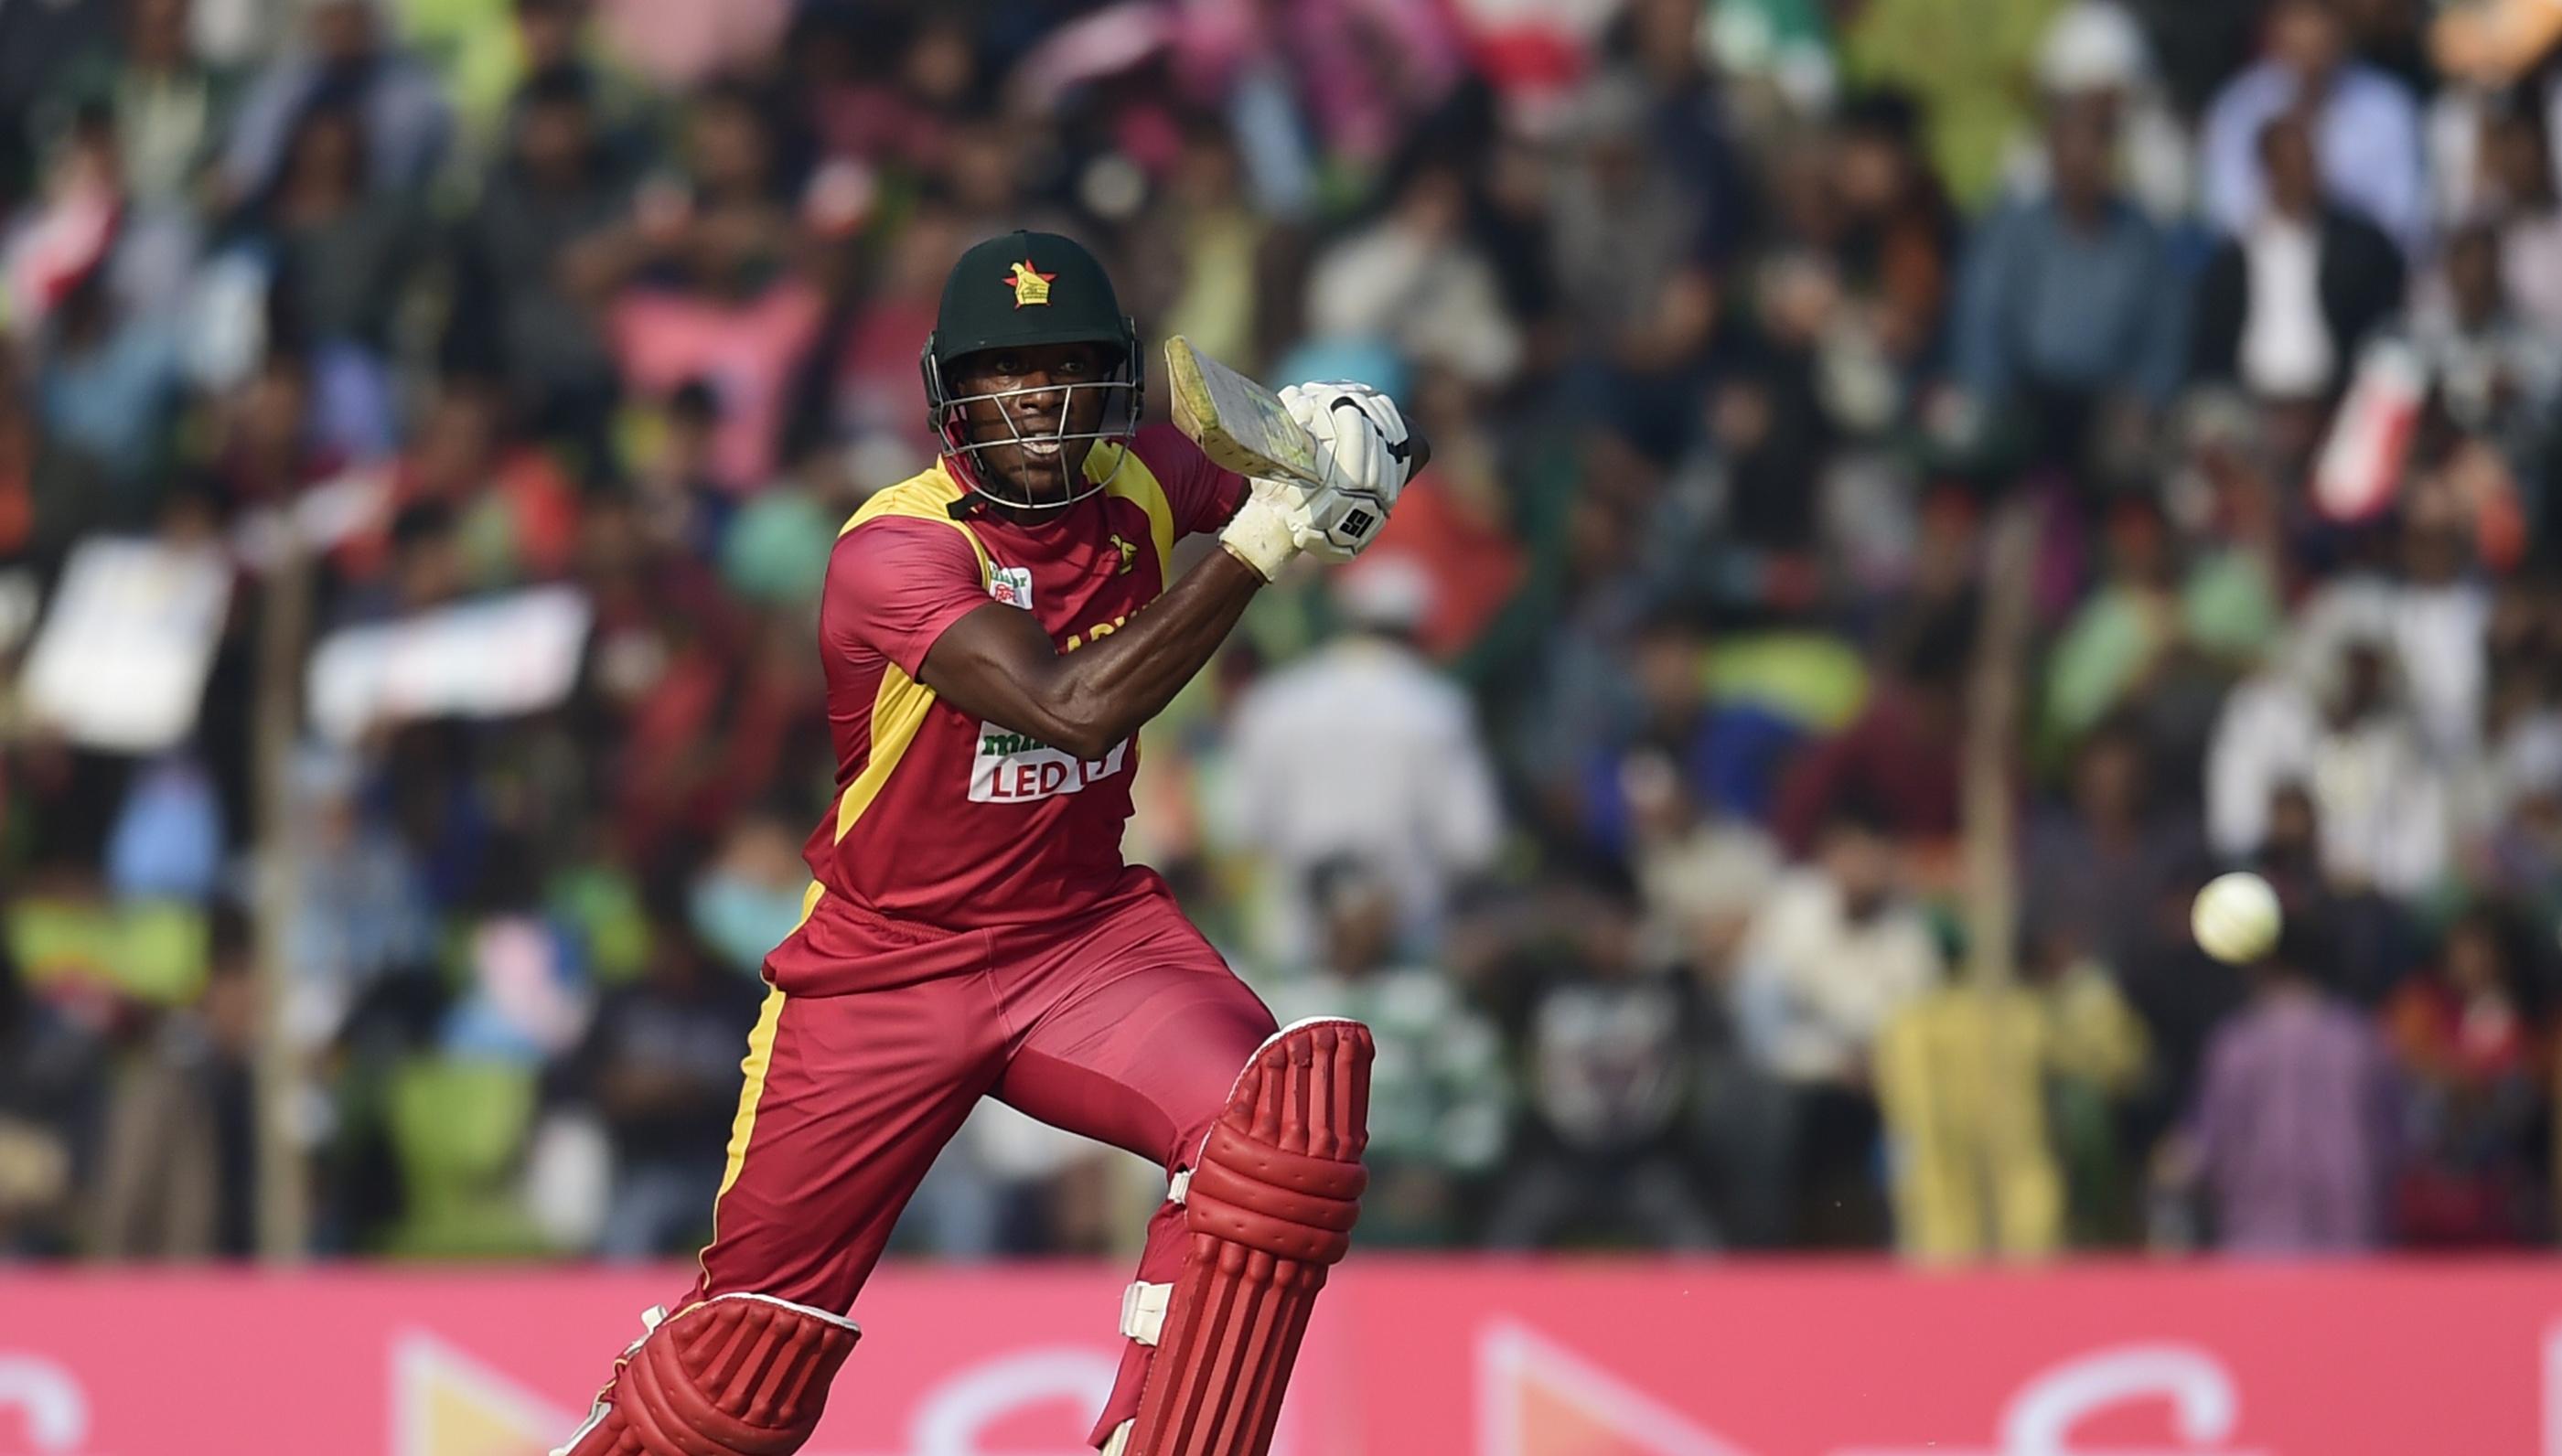 Vusi Sibanda hit a 50 in Zimbabwe's 14-run win over Hong Kong.